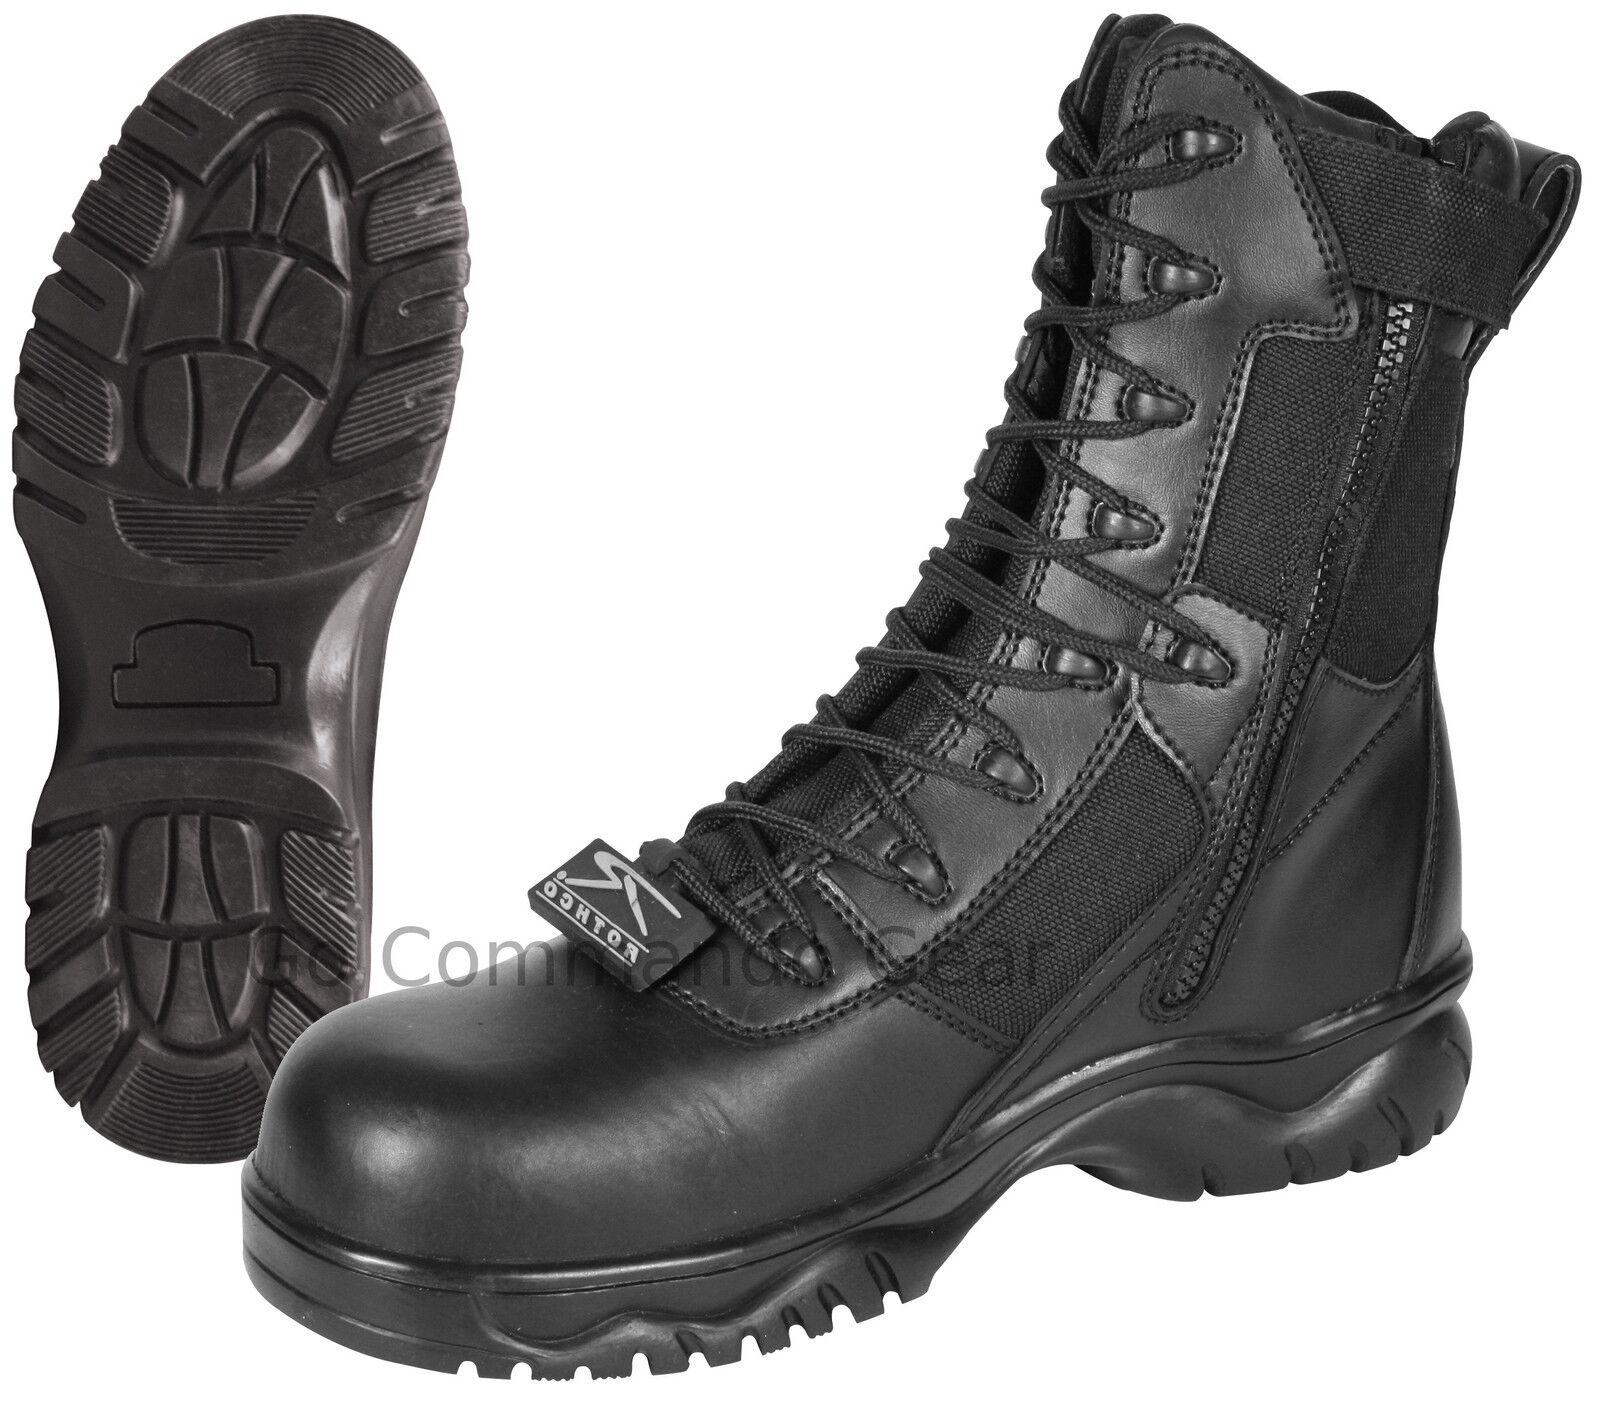 Entrada 8 forzada de 8 Entrada Negro Tactical Bota W / cremallera lateral y Composite Toe-Policial Swat 9f41fb